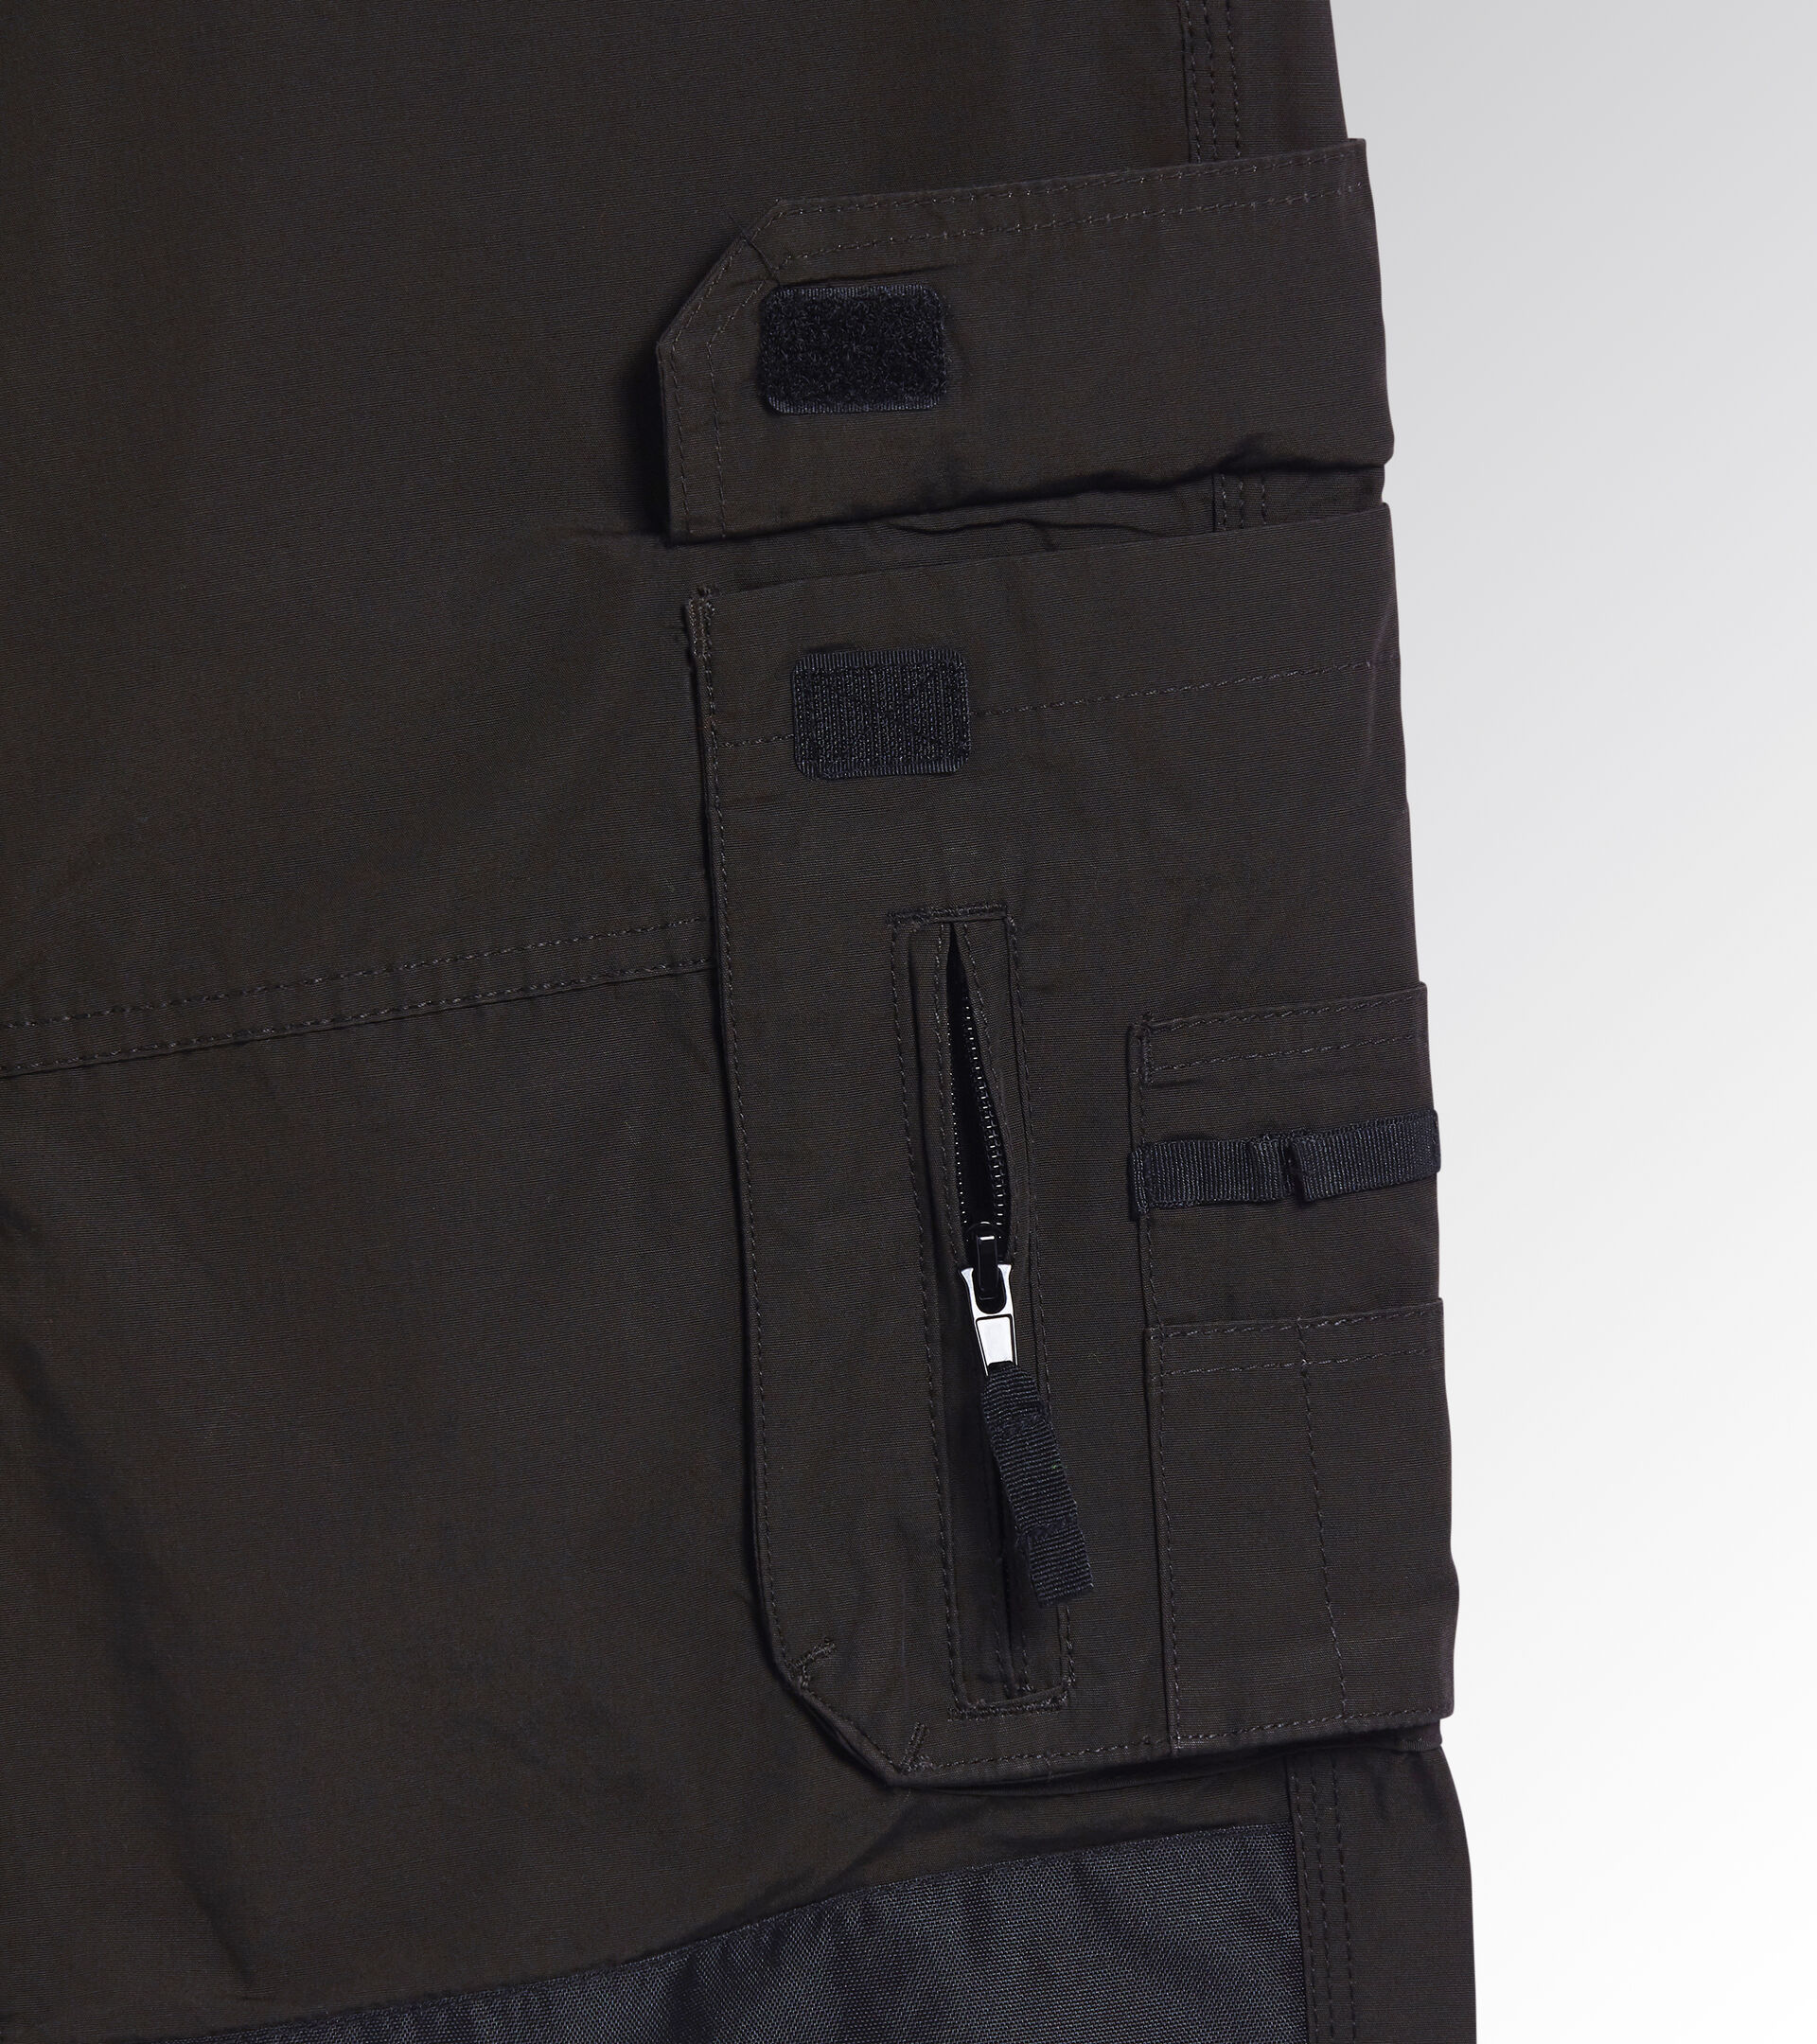 Apparel Utility UOMO PANT WIN PERFORMANCE BLACK FIR GREEN Utility